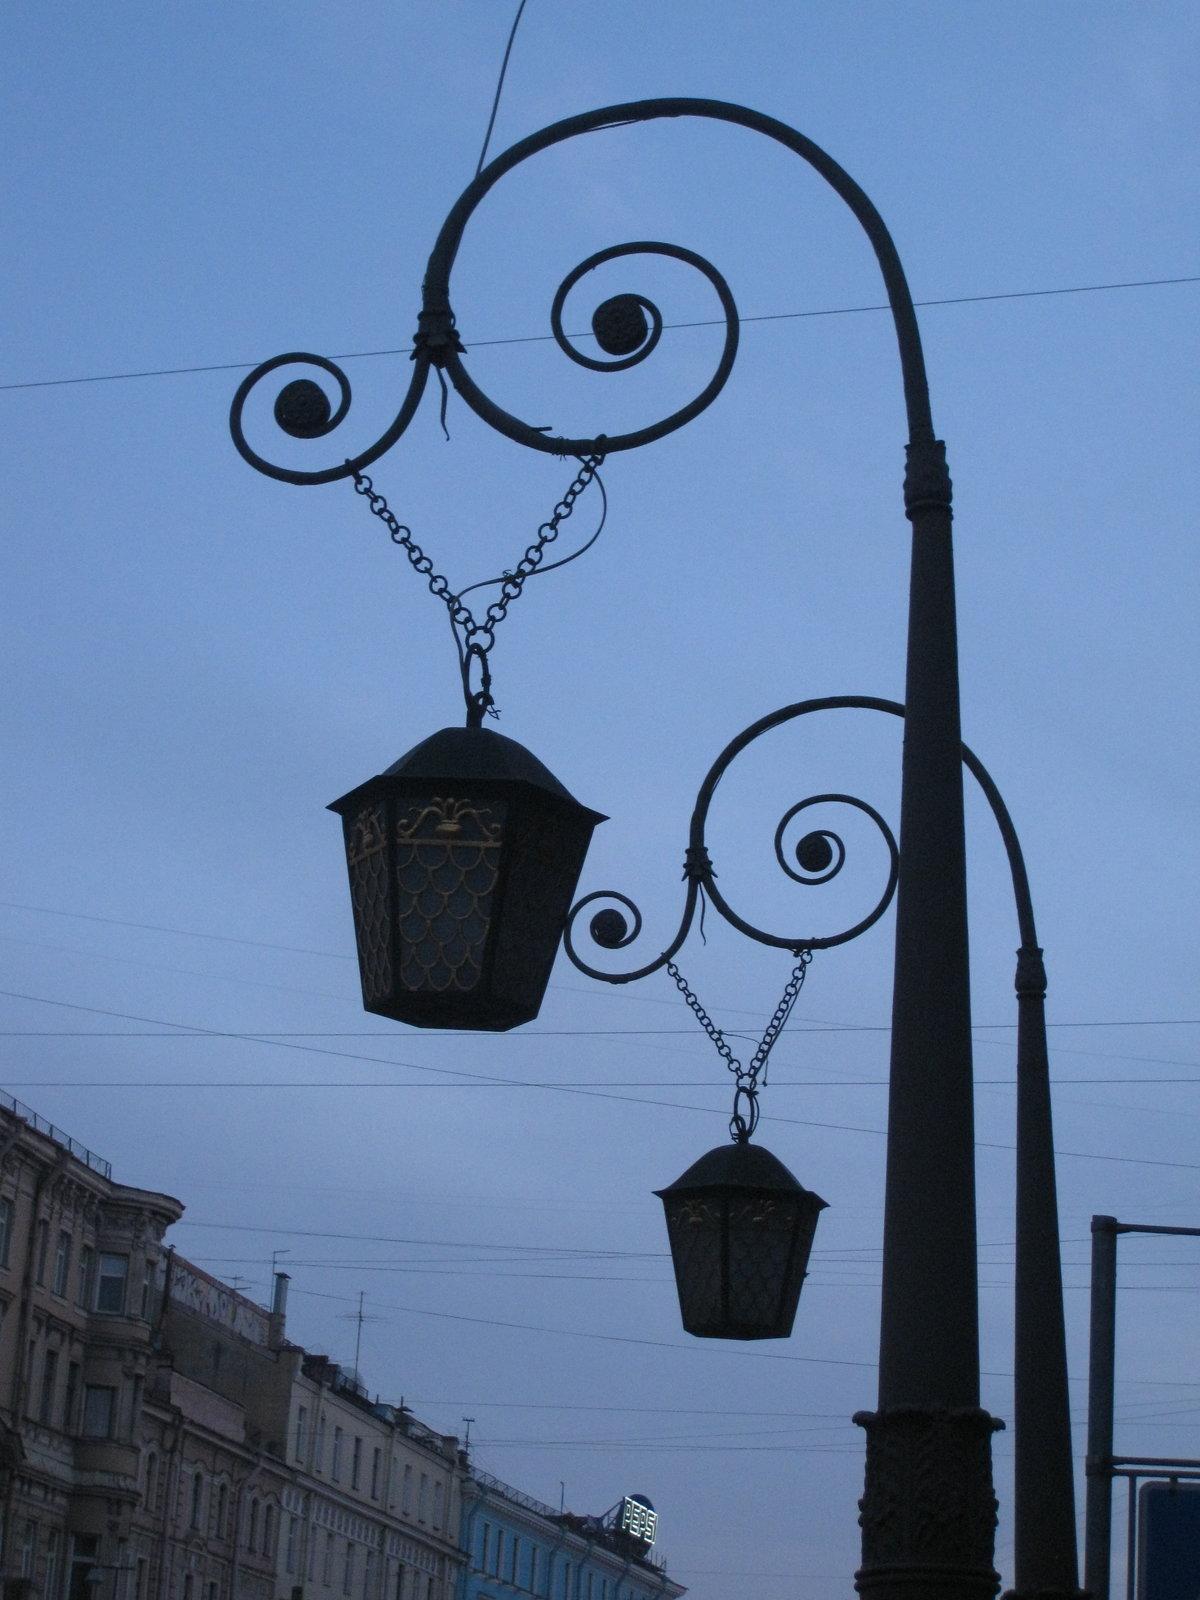 прекрасное картинки петербург при свете фонарей умело сочетают свои